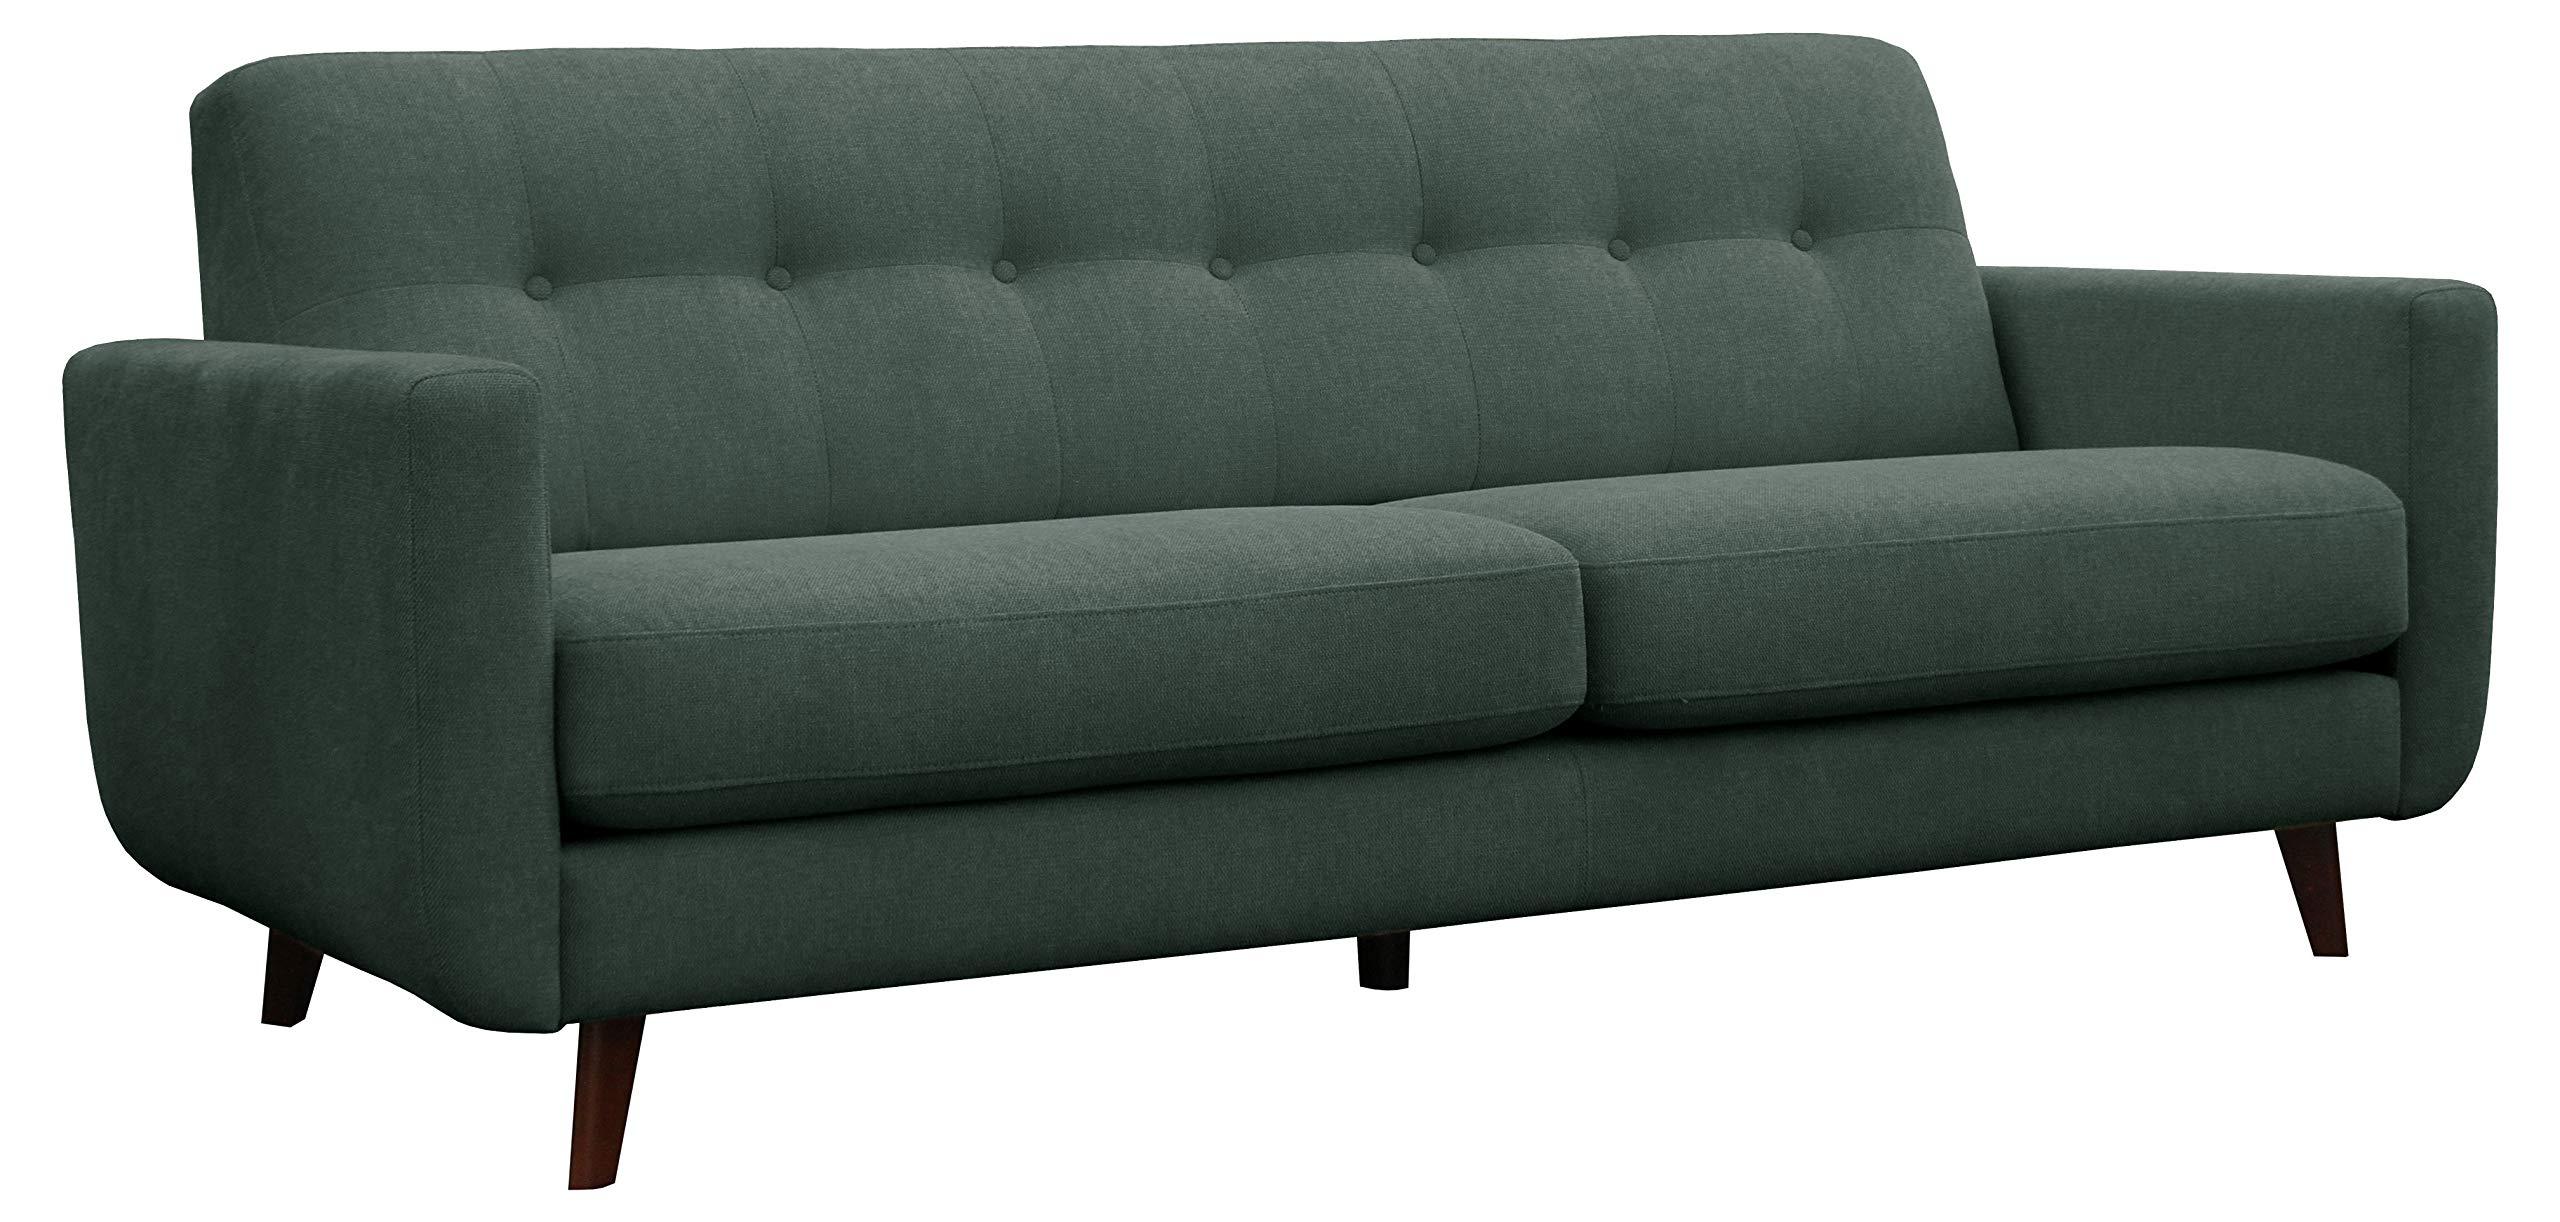 "Amazon Brand – Rivet Sloane Mid-Century Modern Sofa Couch, 79.9""W, Emerald Green"